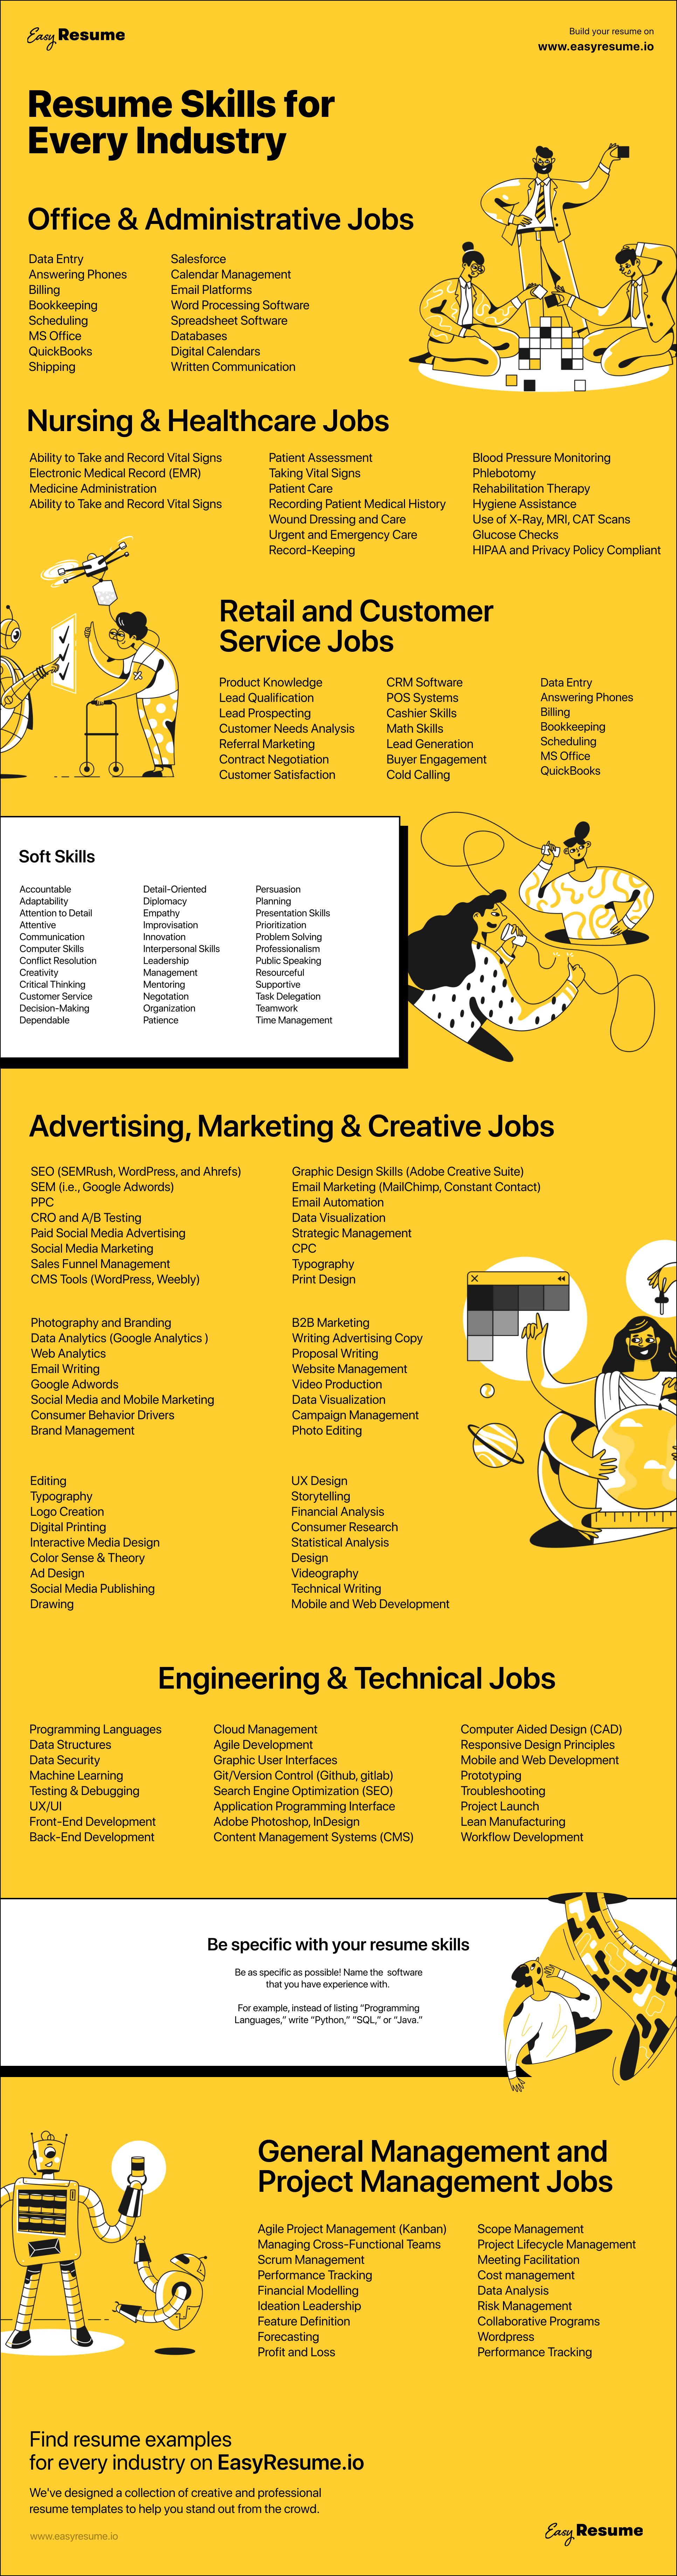 Resume Skills Infographic Resume Skills Resume Skills List Marketing Resume